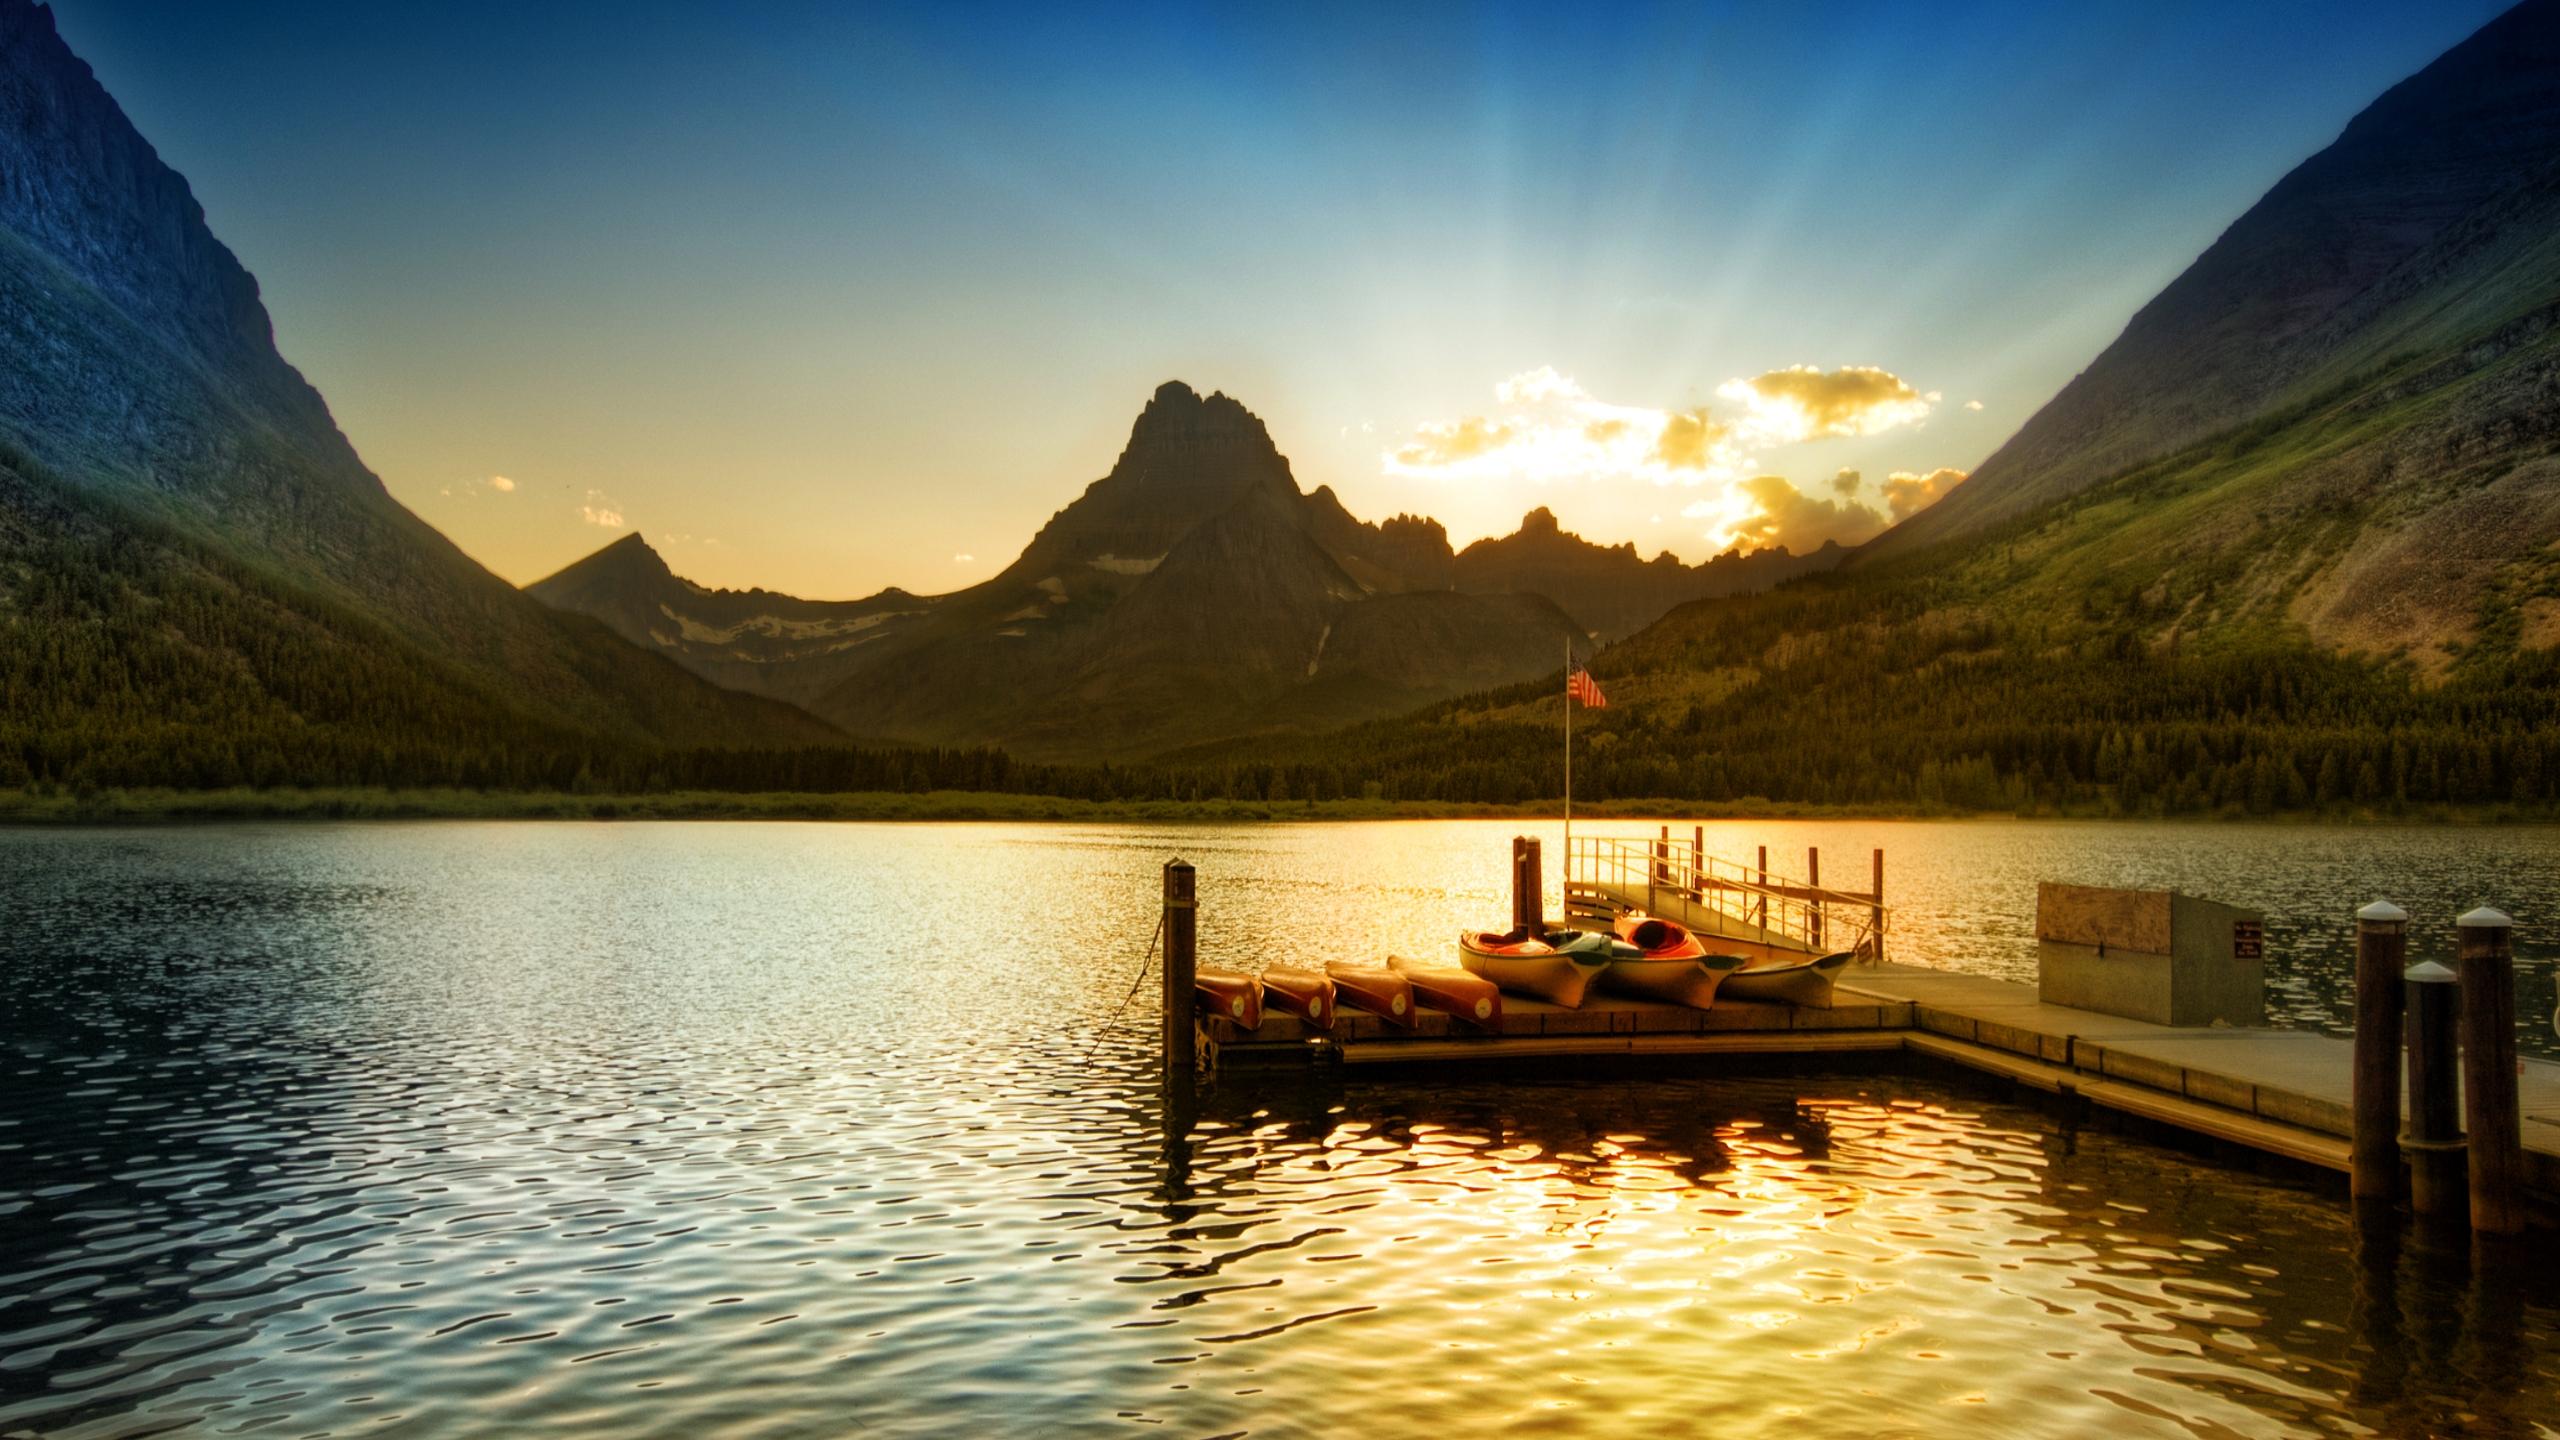 lake backgrounds dark